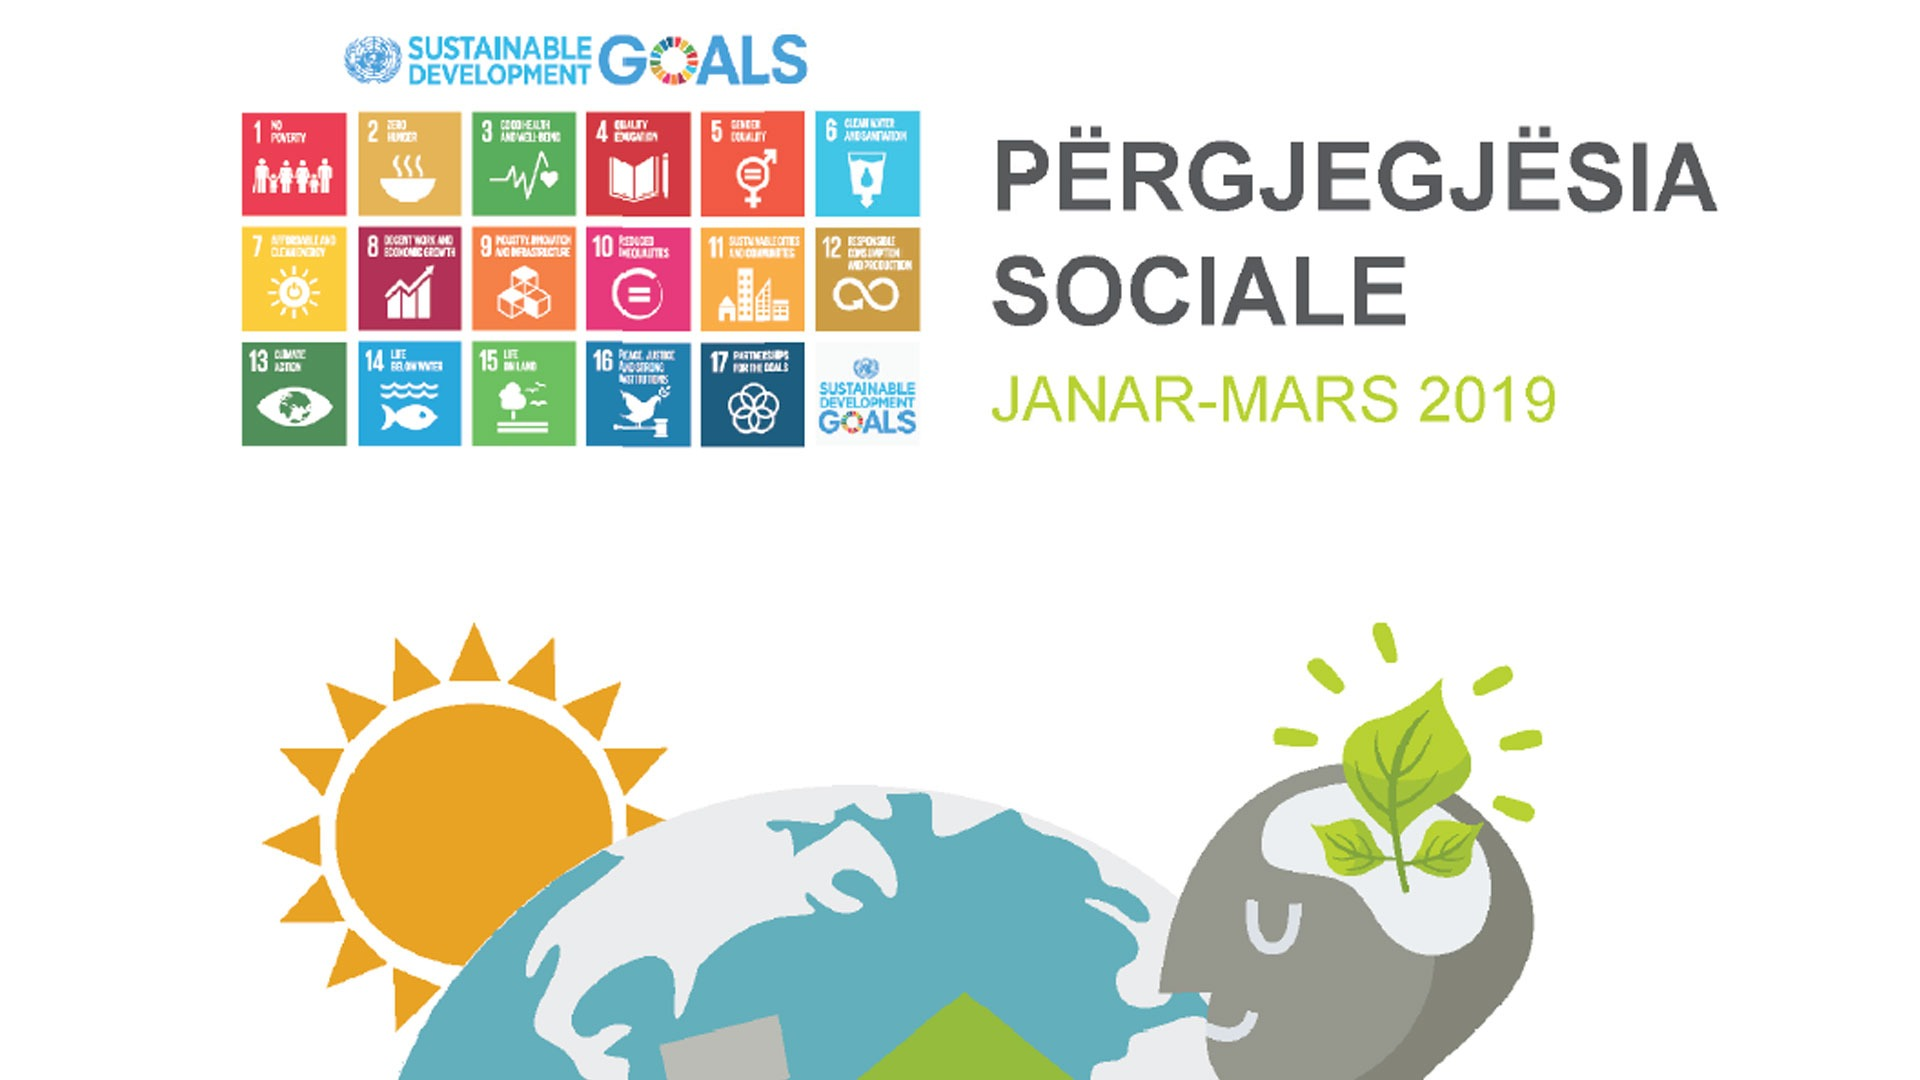 Pergjegjesia Sociale ne Credins pergjate tremujorit te pare te 2019